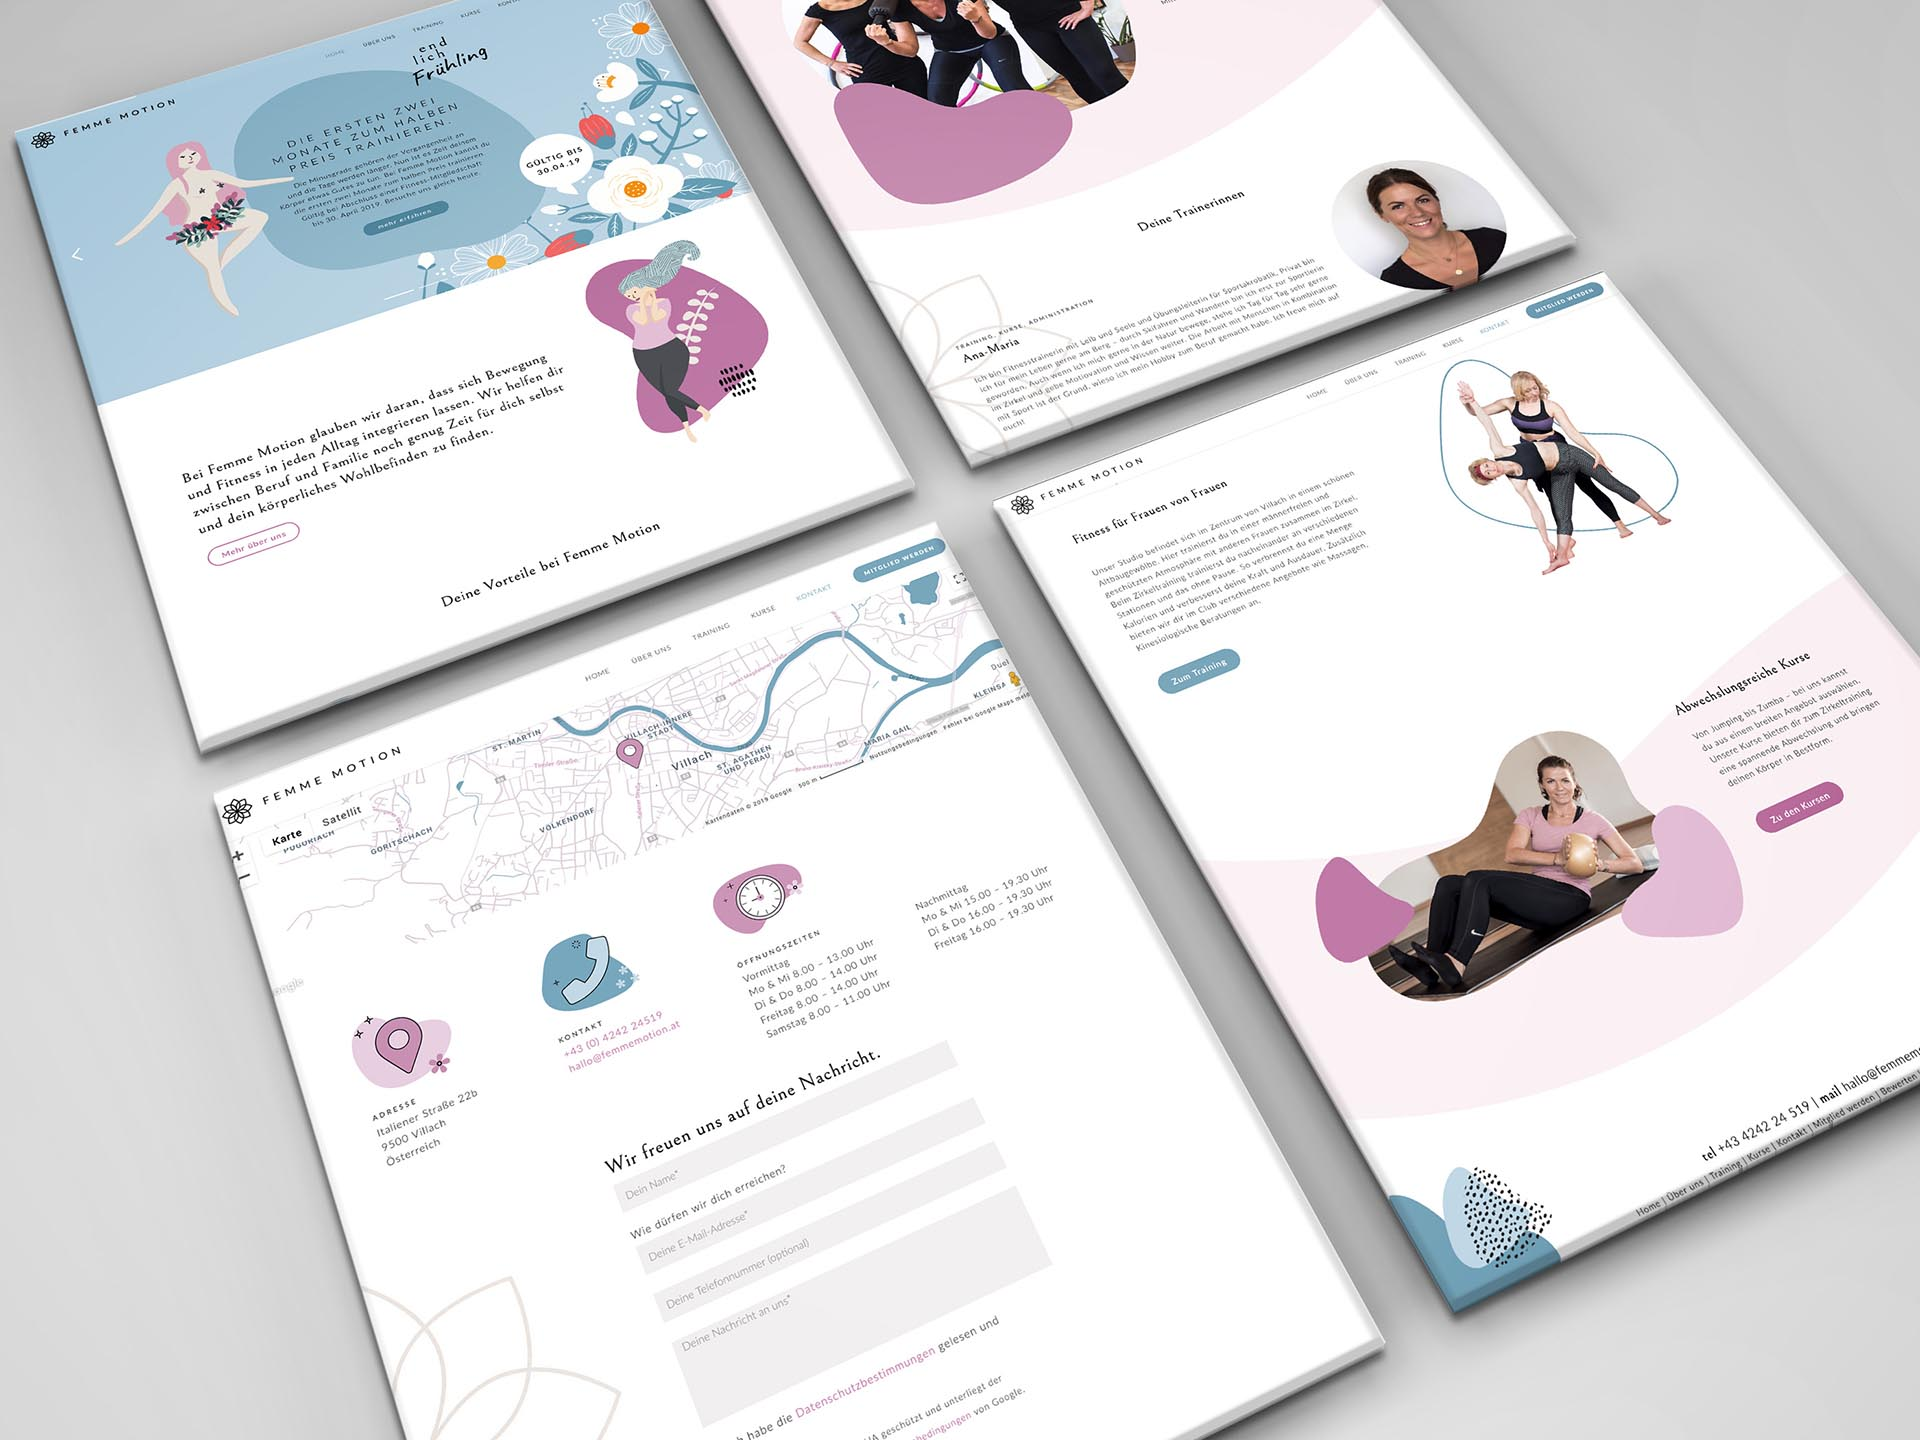 Femme Motion Fitnessstudio Villach - Webdesign für das Frauen Fitnessstudio in Villach - Website Screens